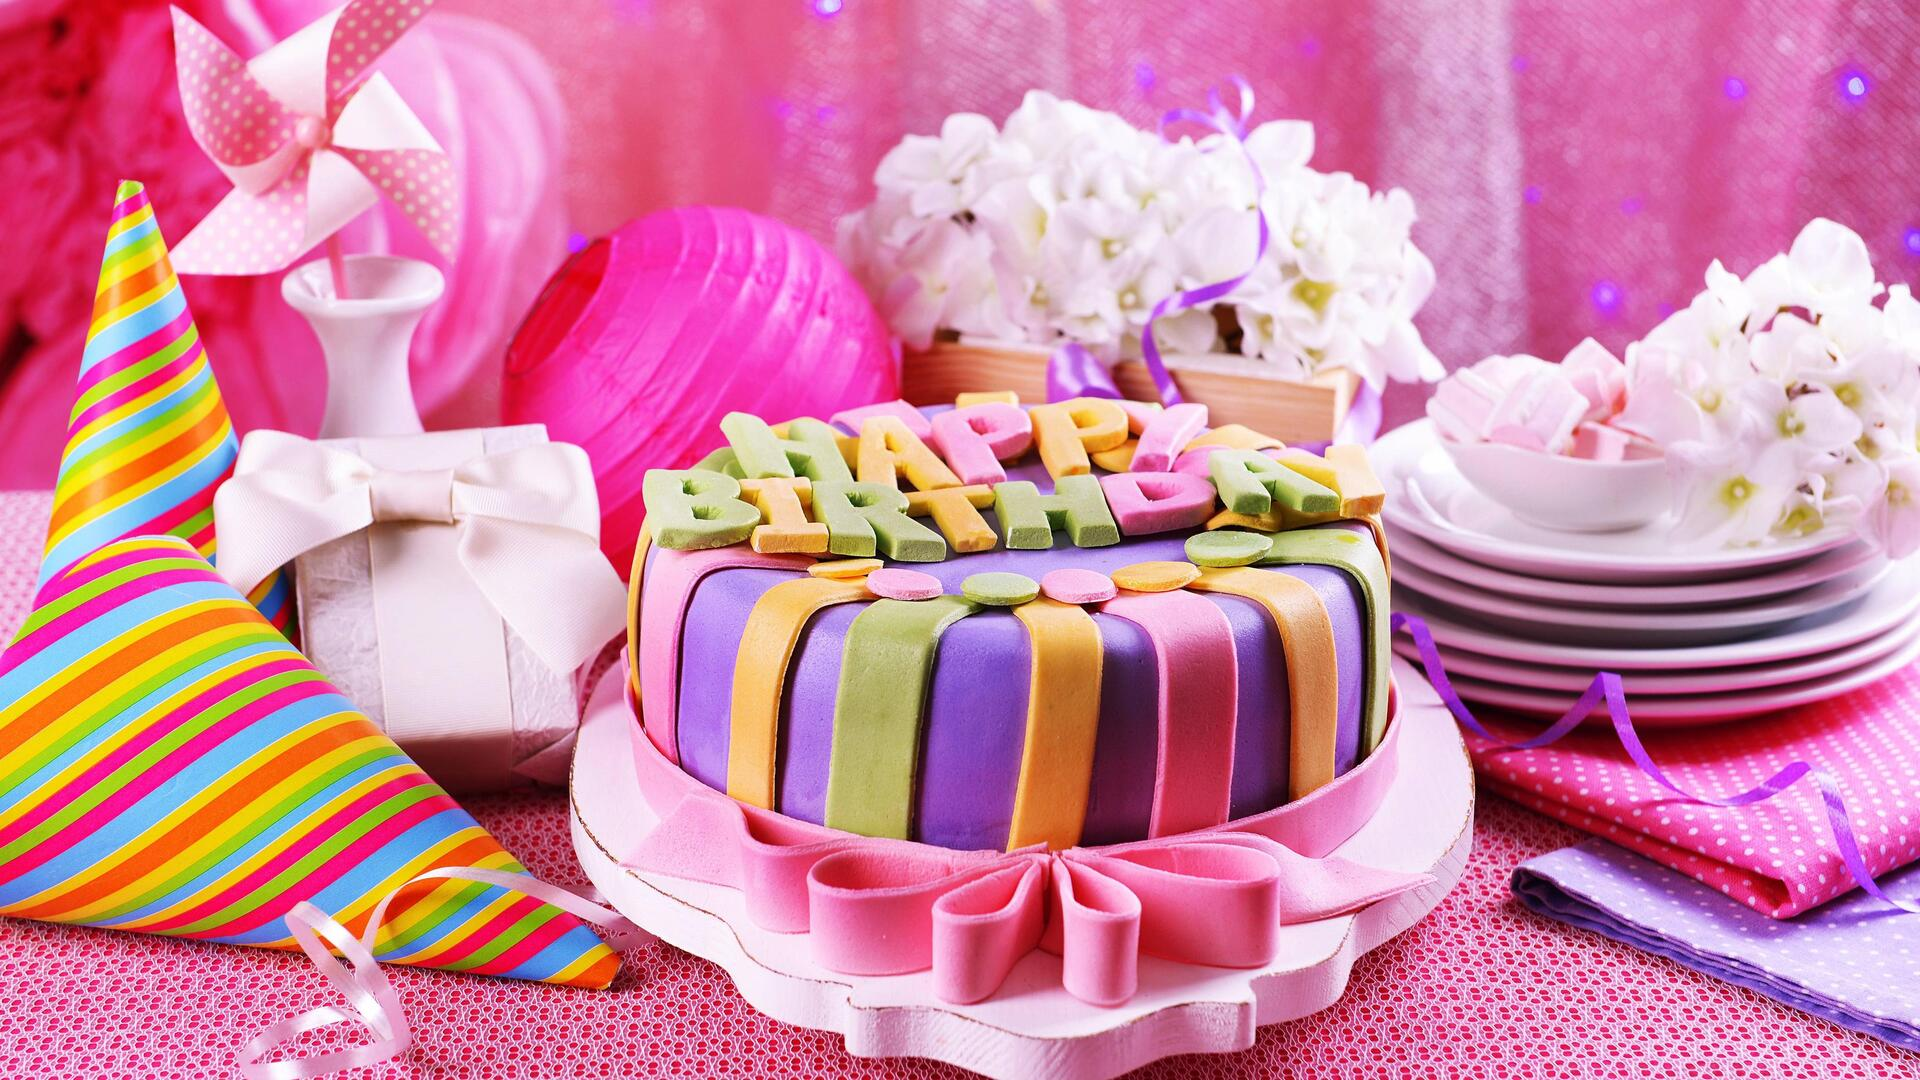 1920x1080 Pink Birthday Cake Laptop Full Hd 1080p Hd 4k